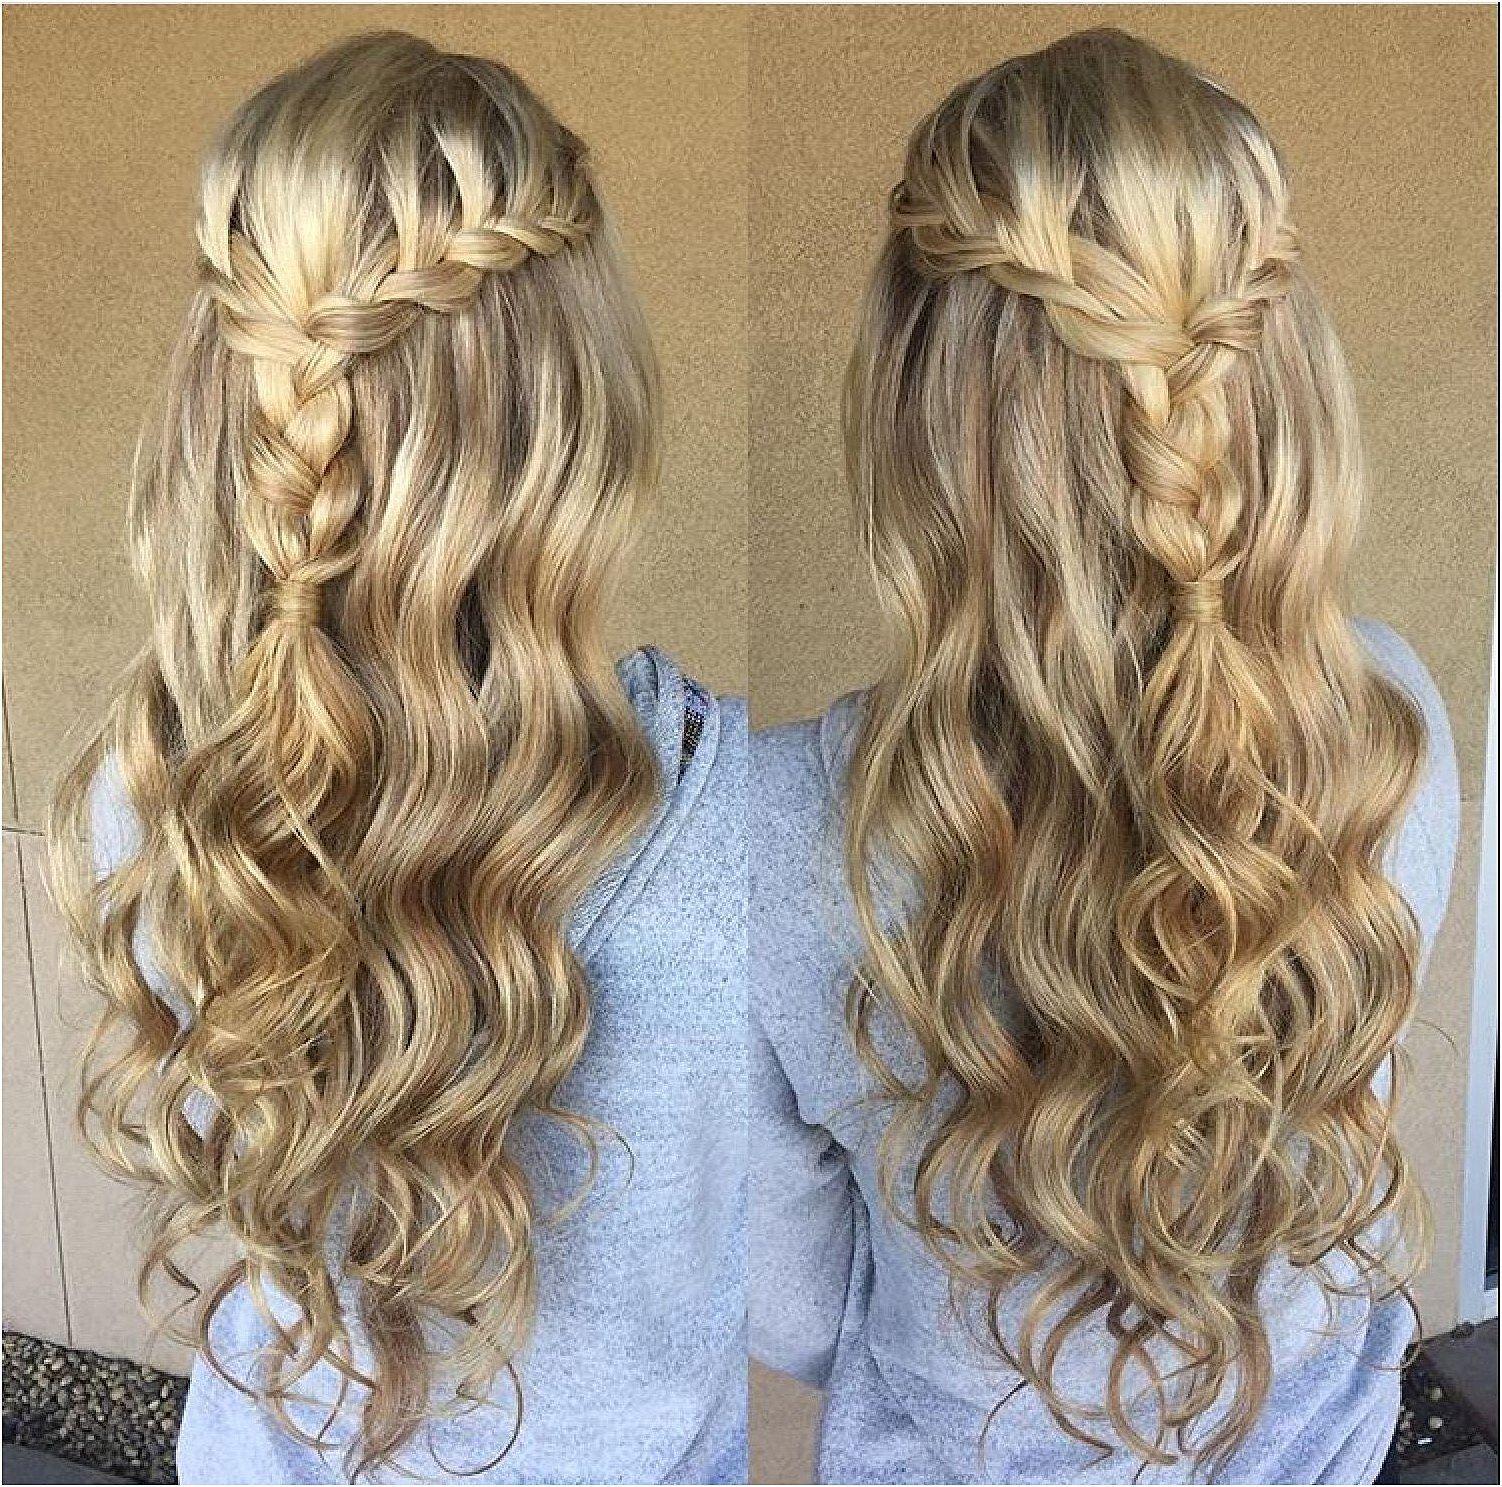 Blonde braid prom formal hairstyle half up long hair wedding updo